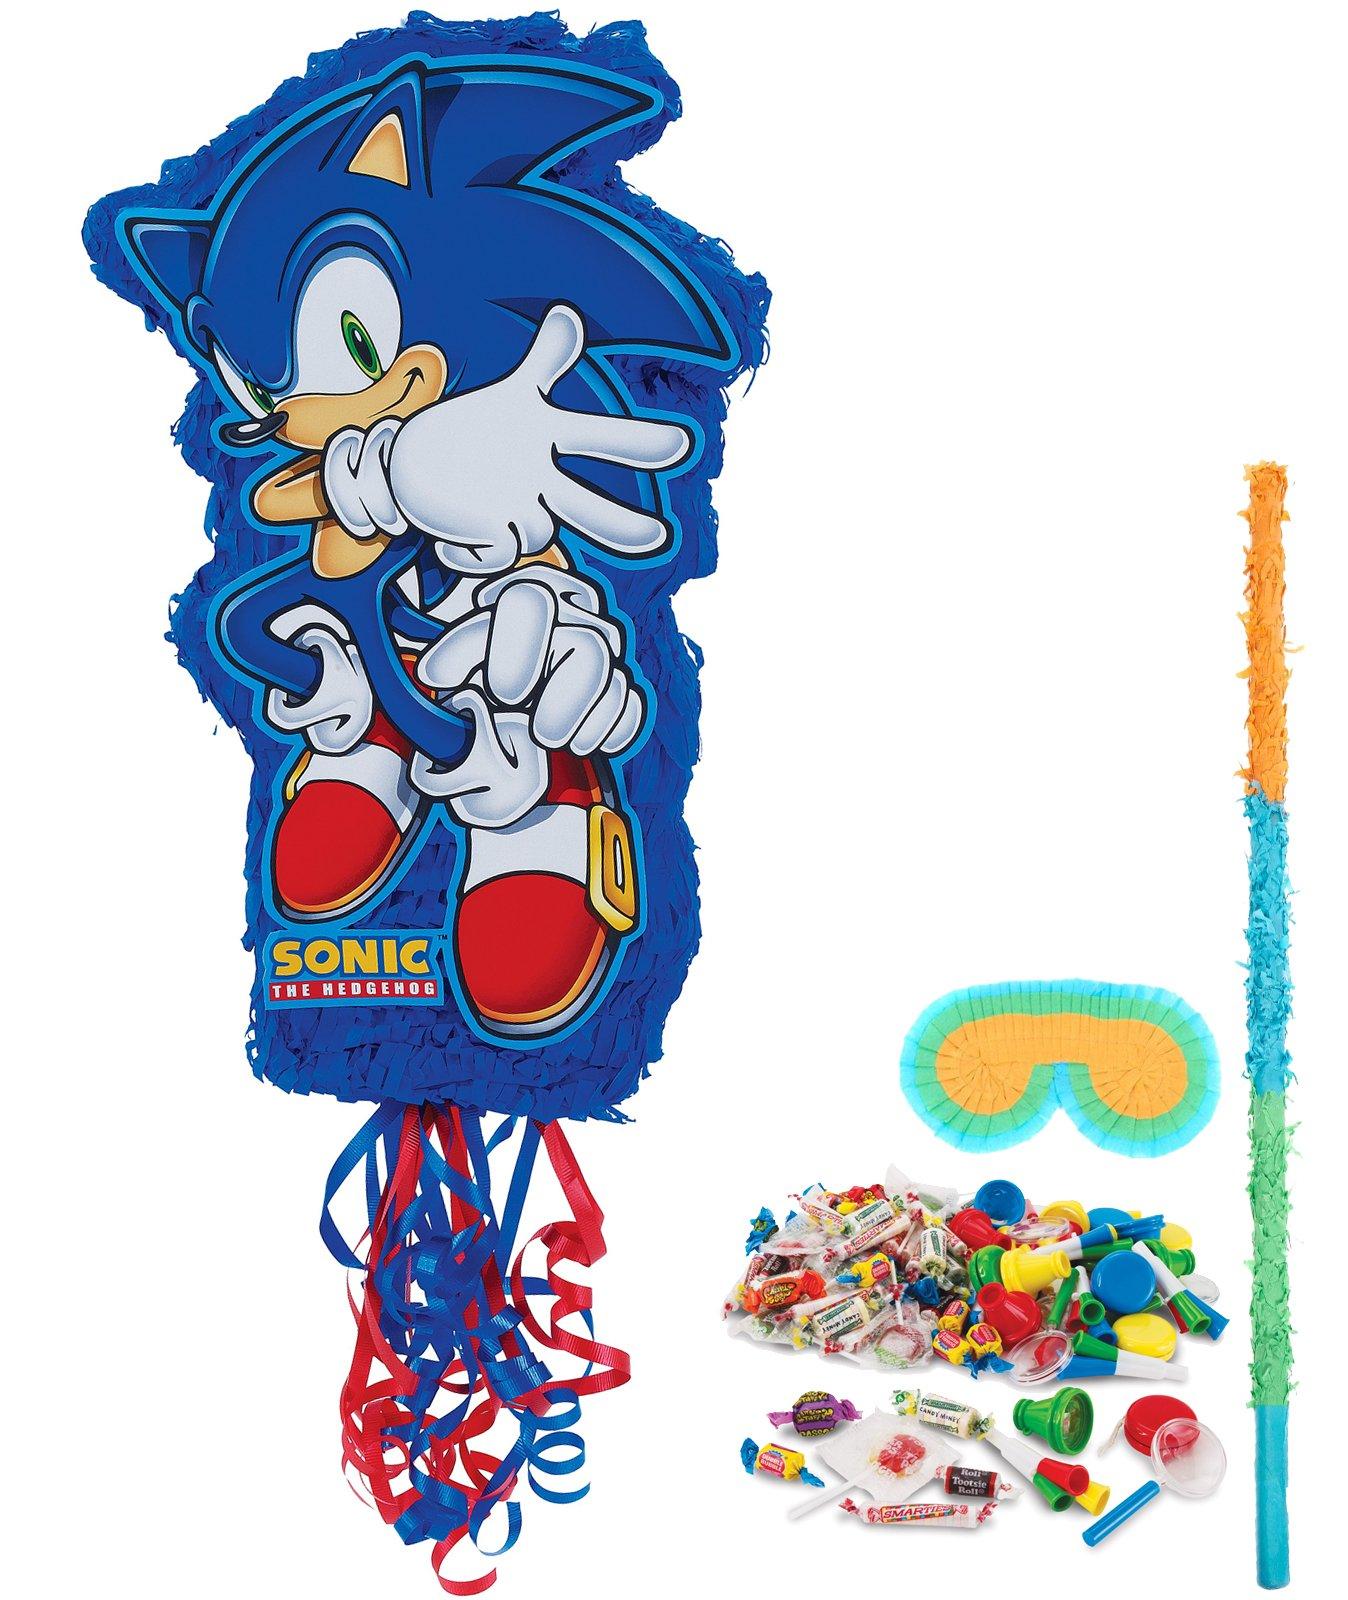 BirthdayExpress Sonic the Hedgehog Party Supplies - Pinata Kit